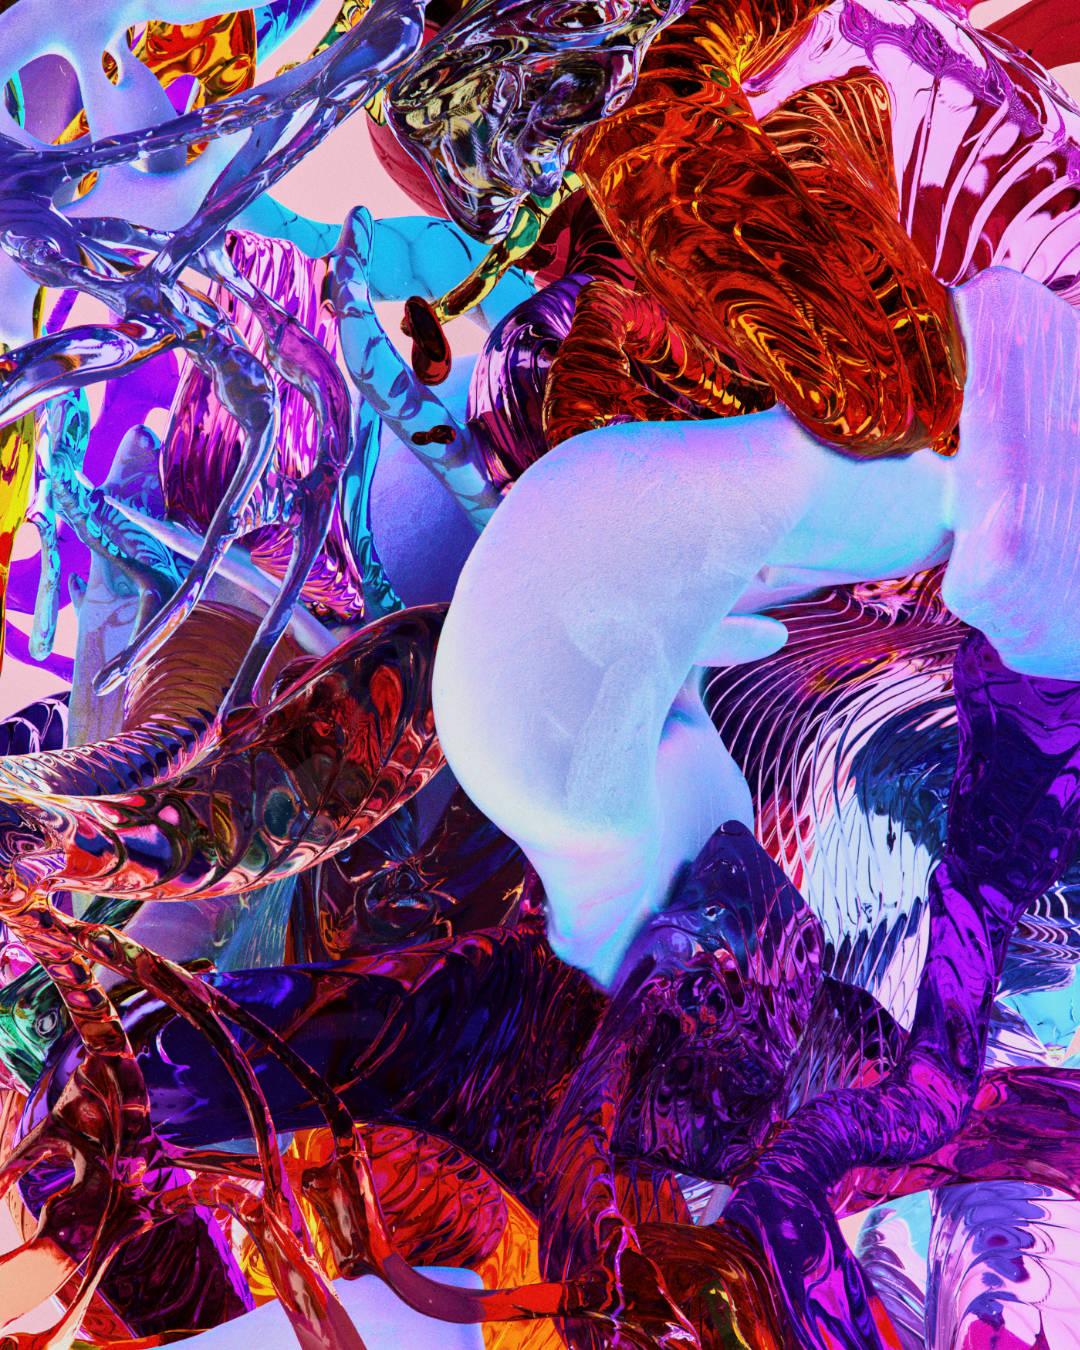 fakenewstudio_x_danny_ivan_synthetic_fossils_02